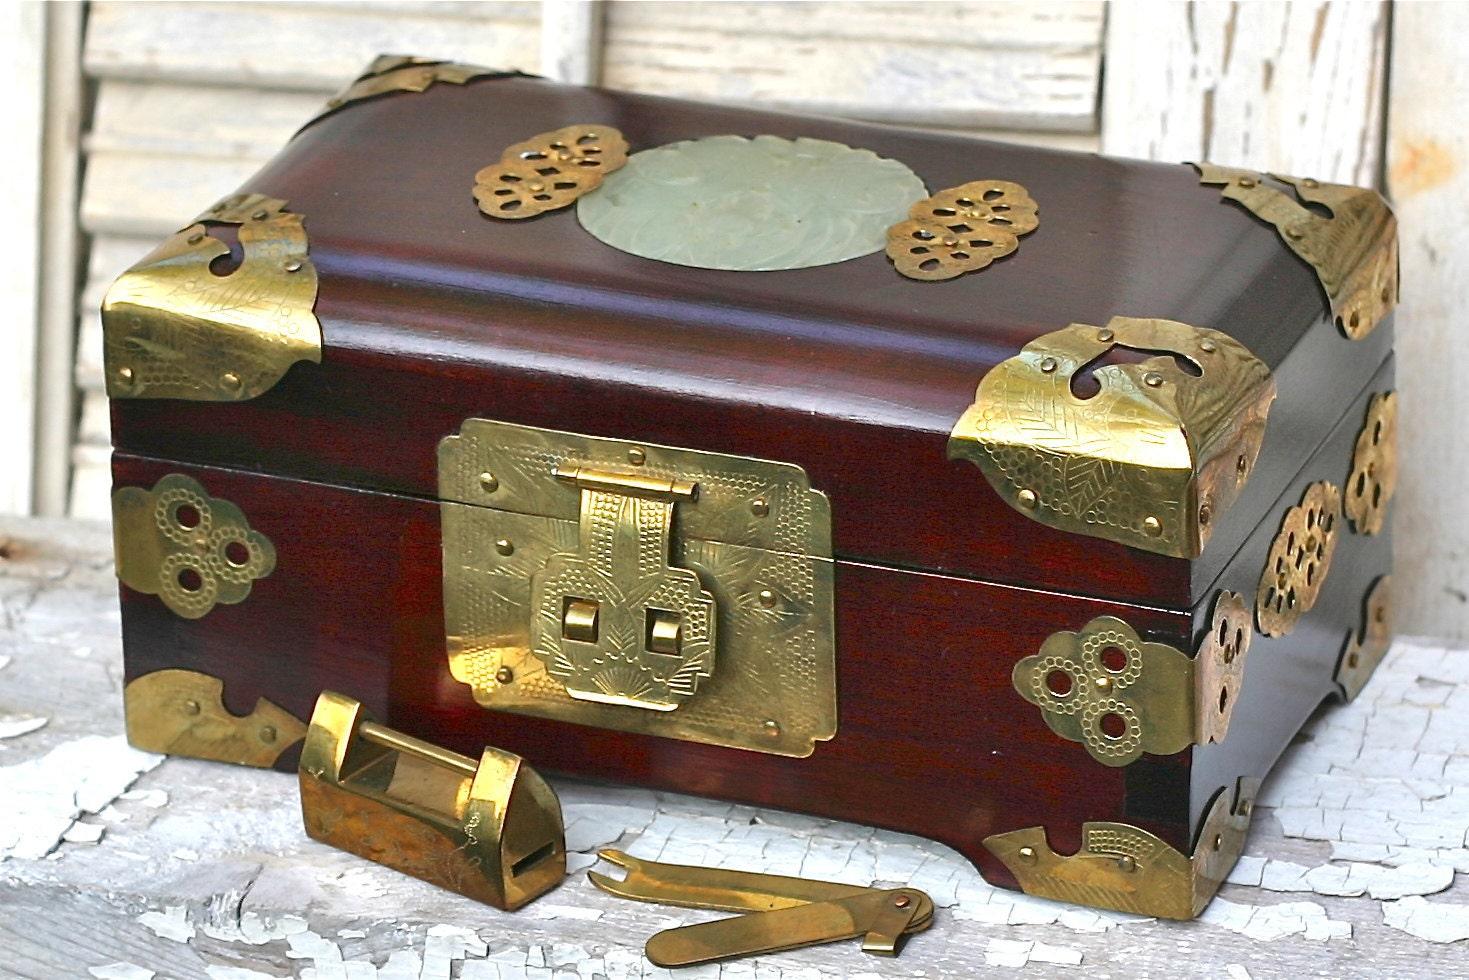 Stare ukrasne kutije za nakit ... - Page 4 Il_fullxfull.258102237